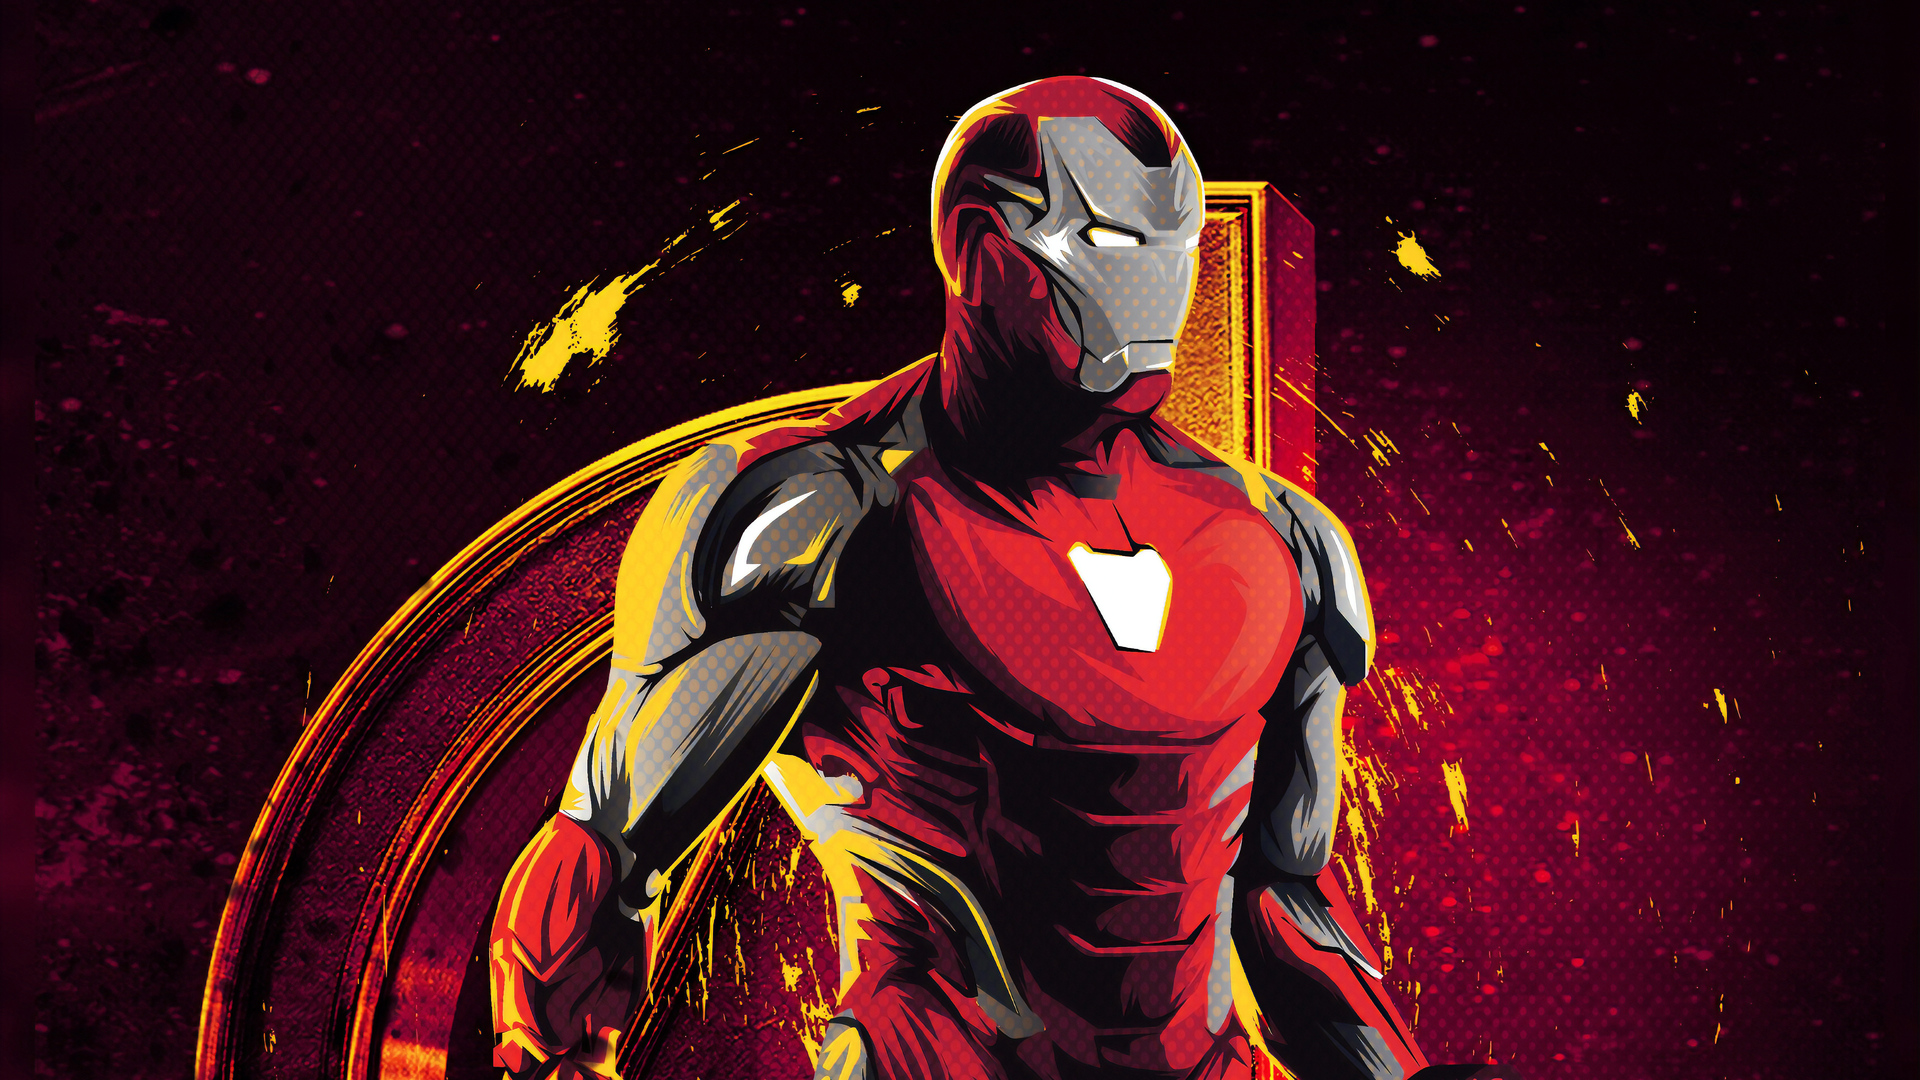 1920x1080 Iron Man Avenger Laptop Full HD 1080P HD 4k Wallpapers, Images, Backgrounds, Photos ...